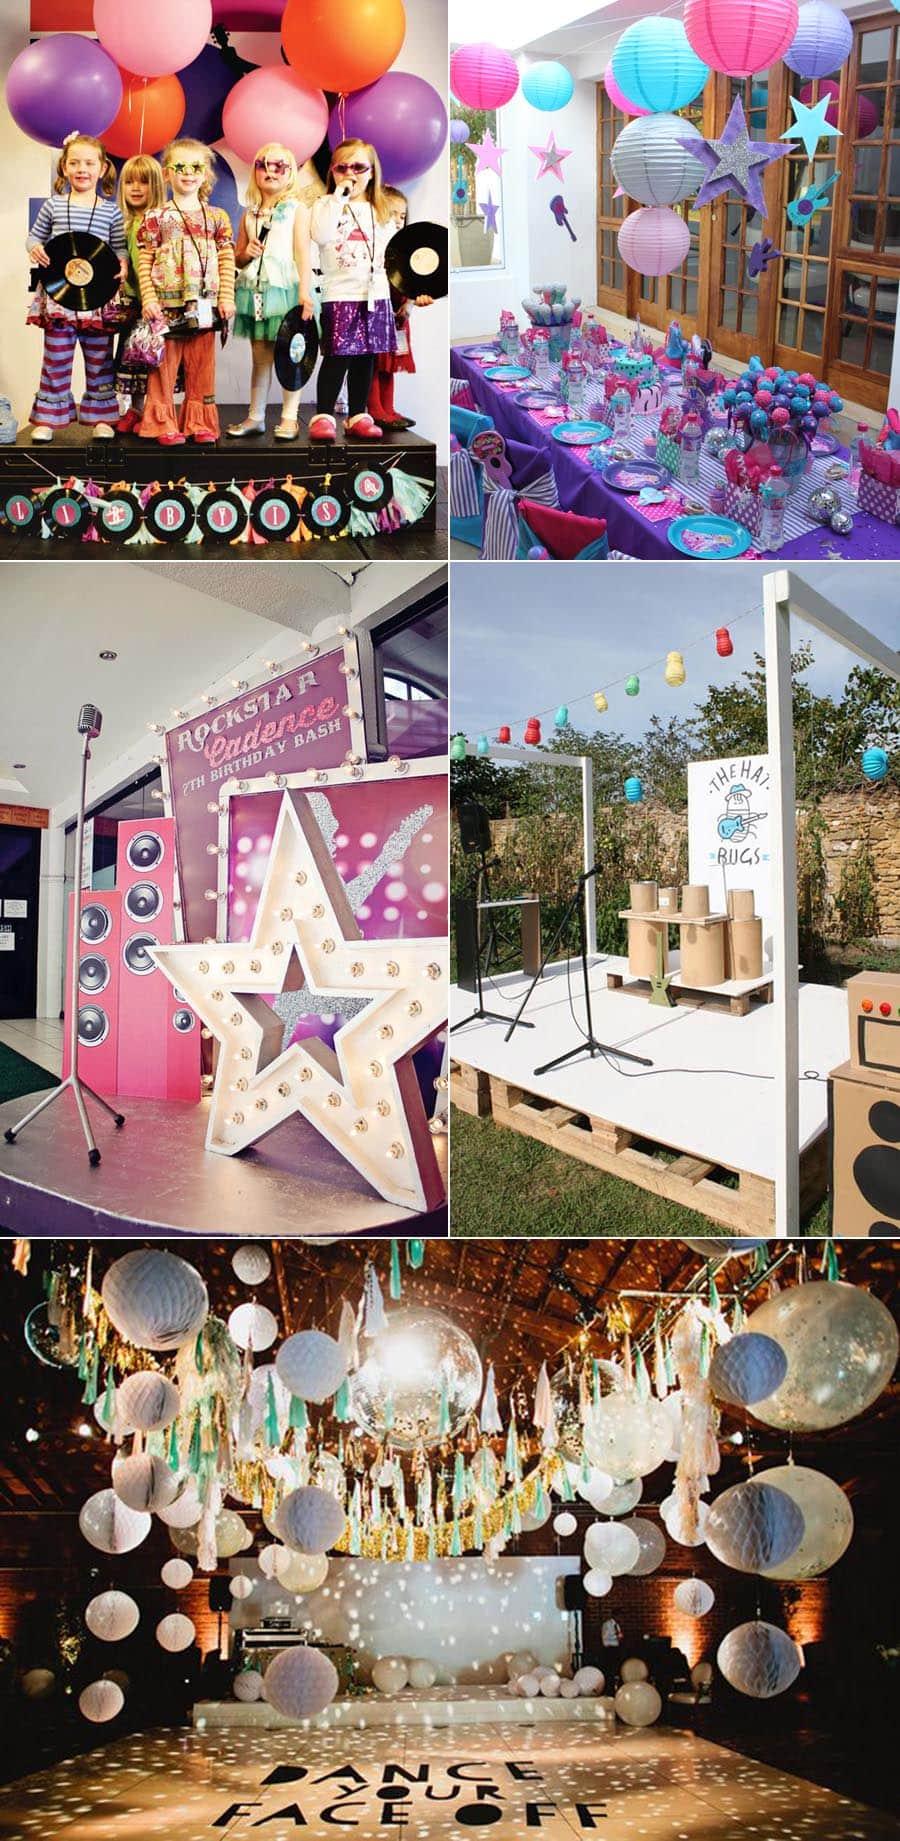 rockstar themed party ideas